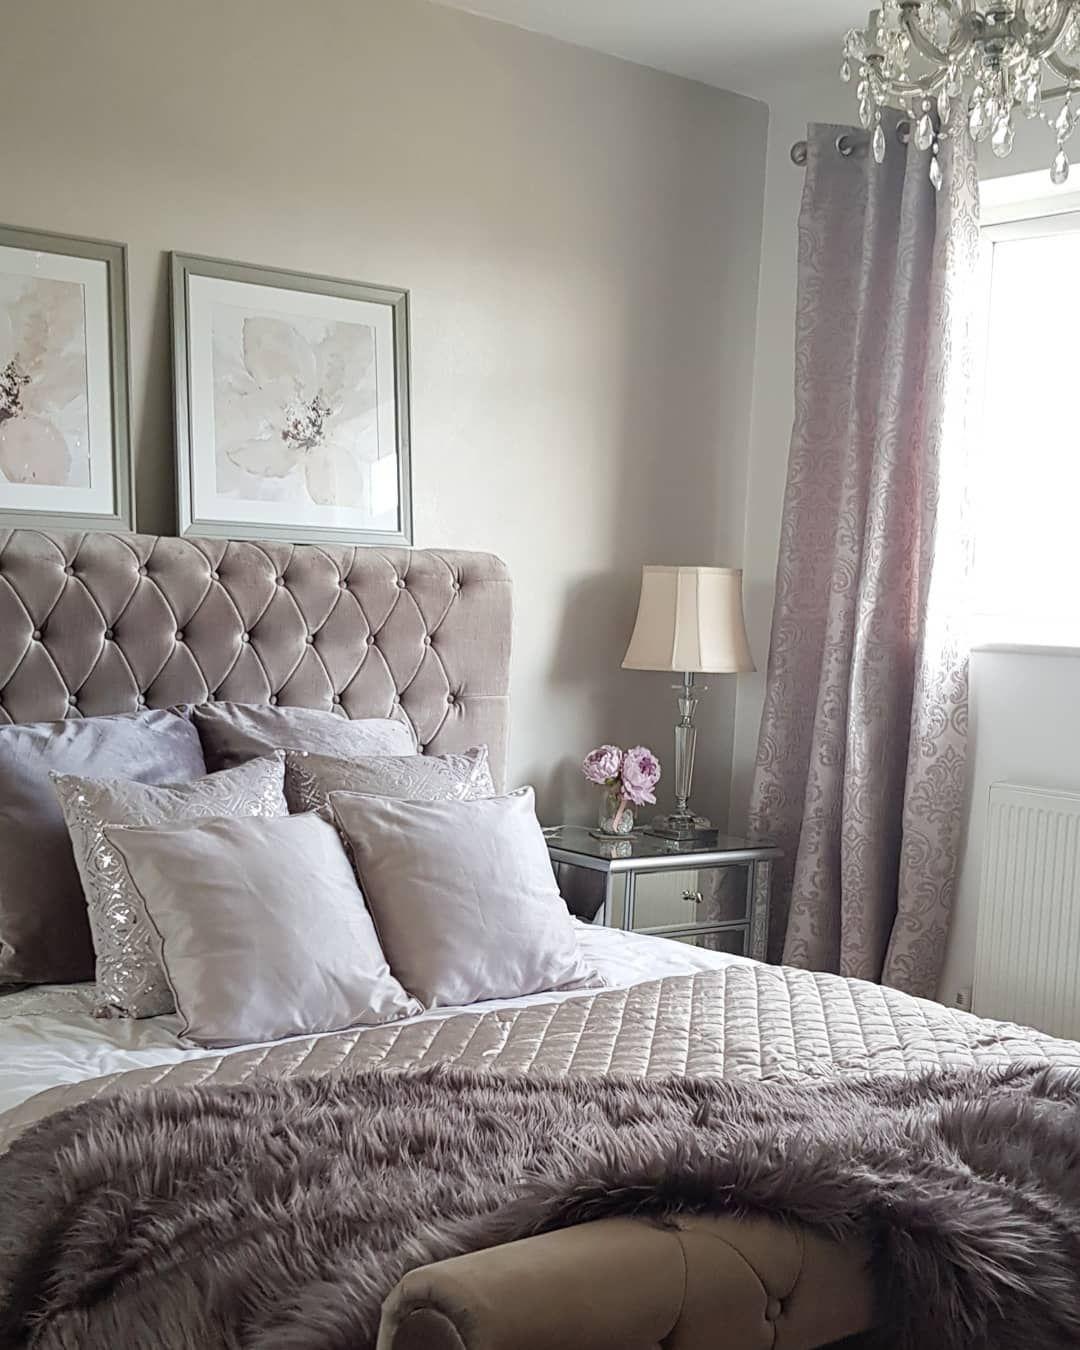 Mauve Mink Bedroom Trends Luxury Master Bedroom Decor Bed Cushions Home Decor Bedroom Luxury Bedroom Master Luxurious Bedrooms Mink living room decor